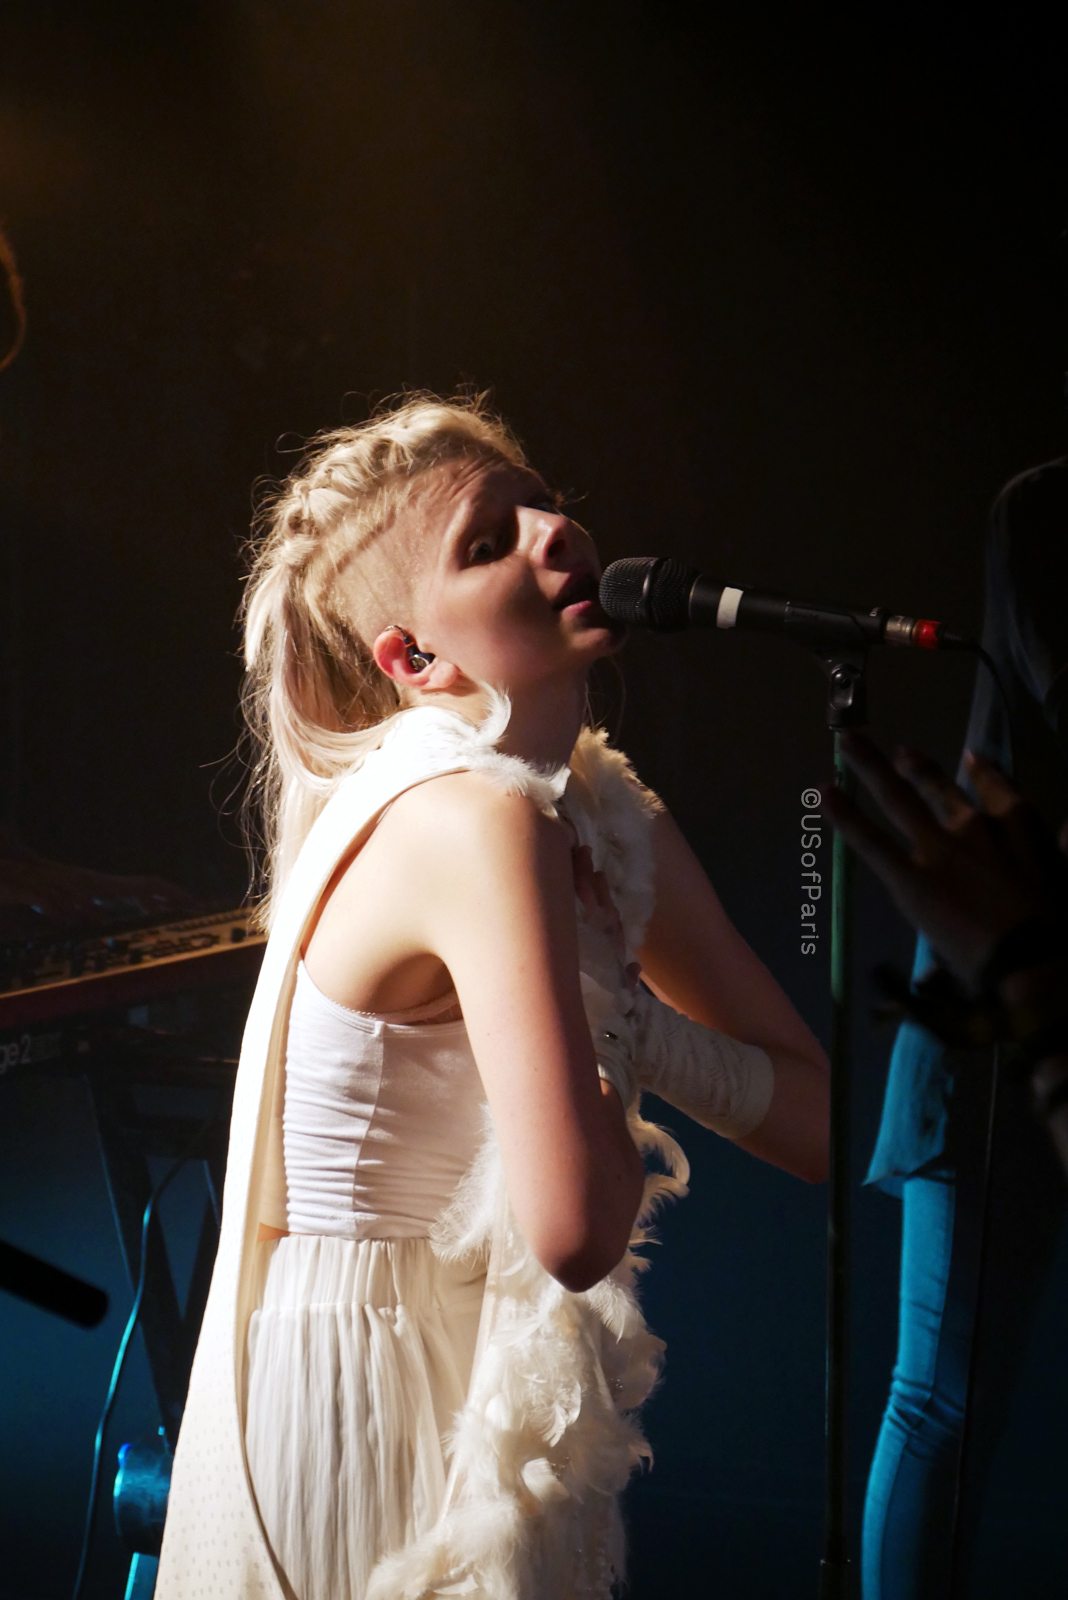 aurora-music-aksnes-singer-chanteuse-live-concert-paris-france-stage-photo-usofparis-blog